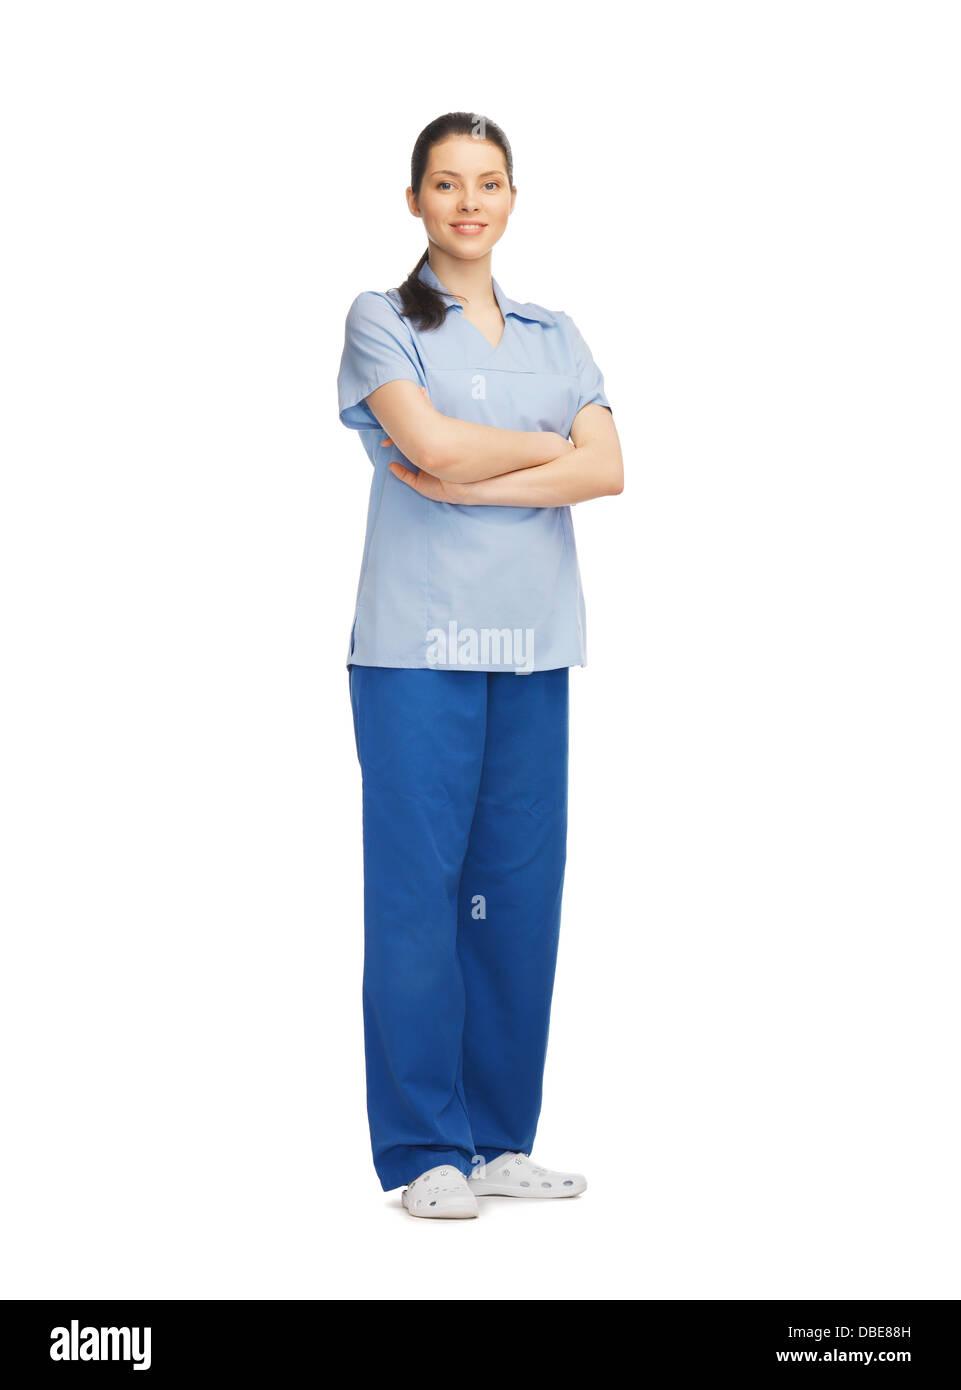 smiling female doctor - Stock Image